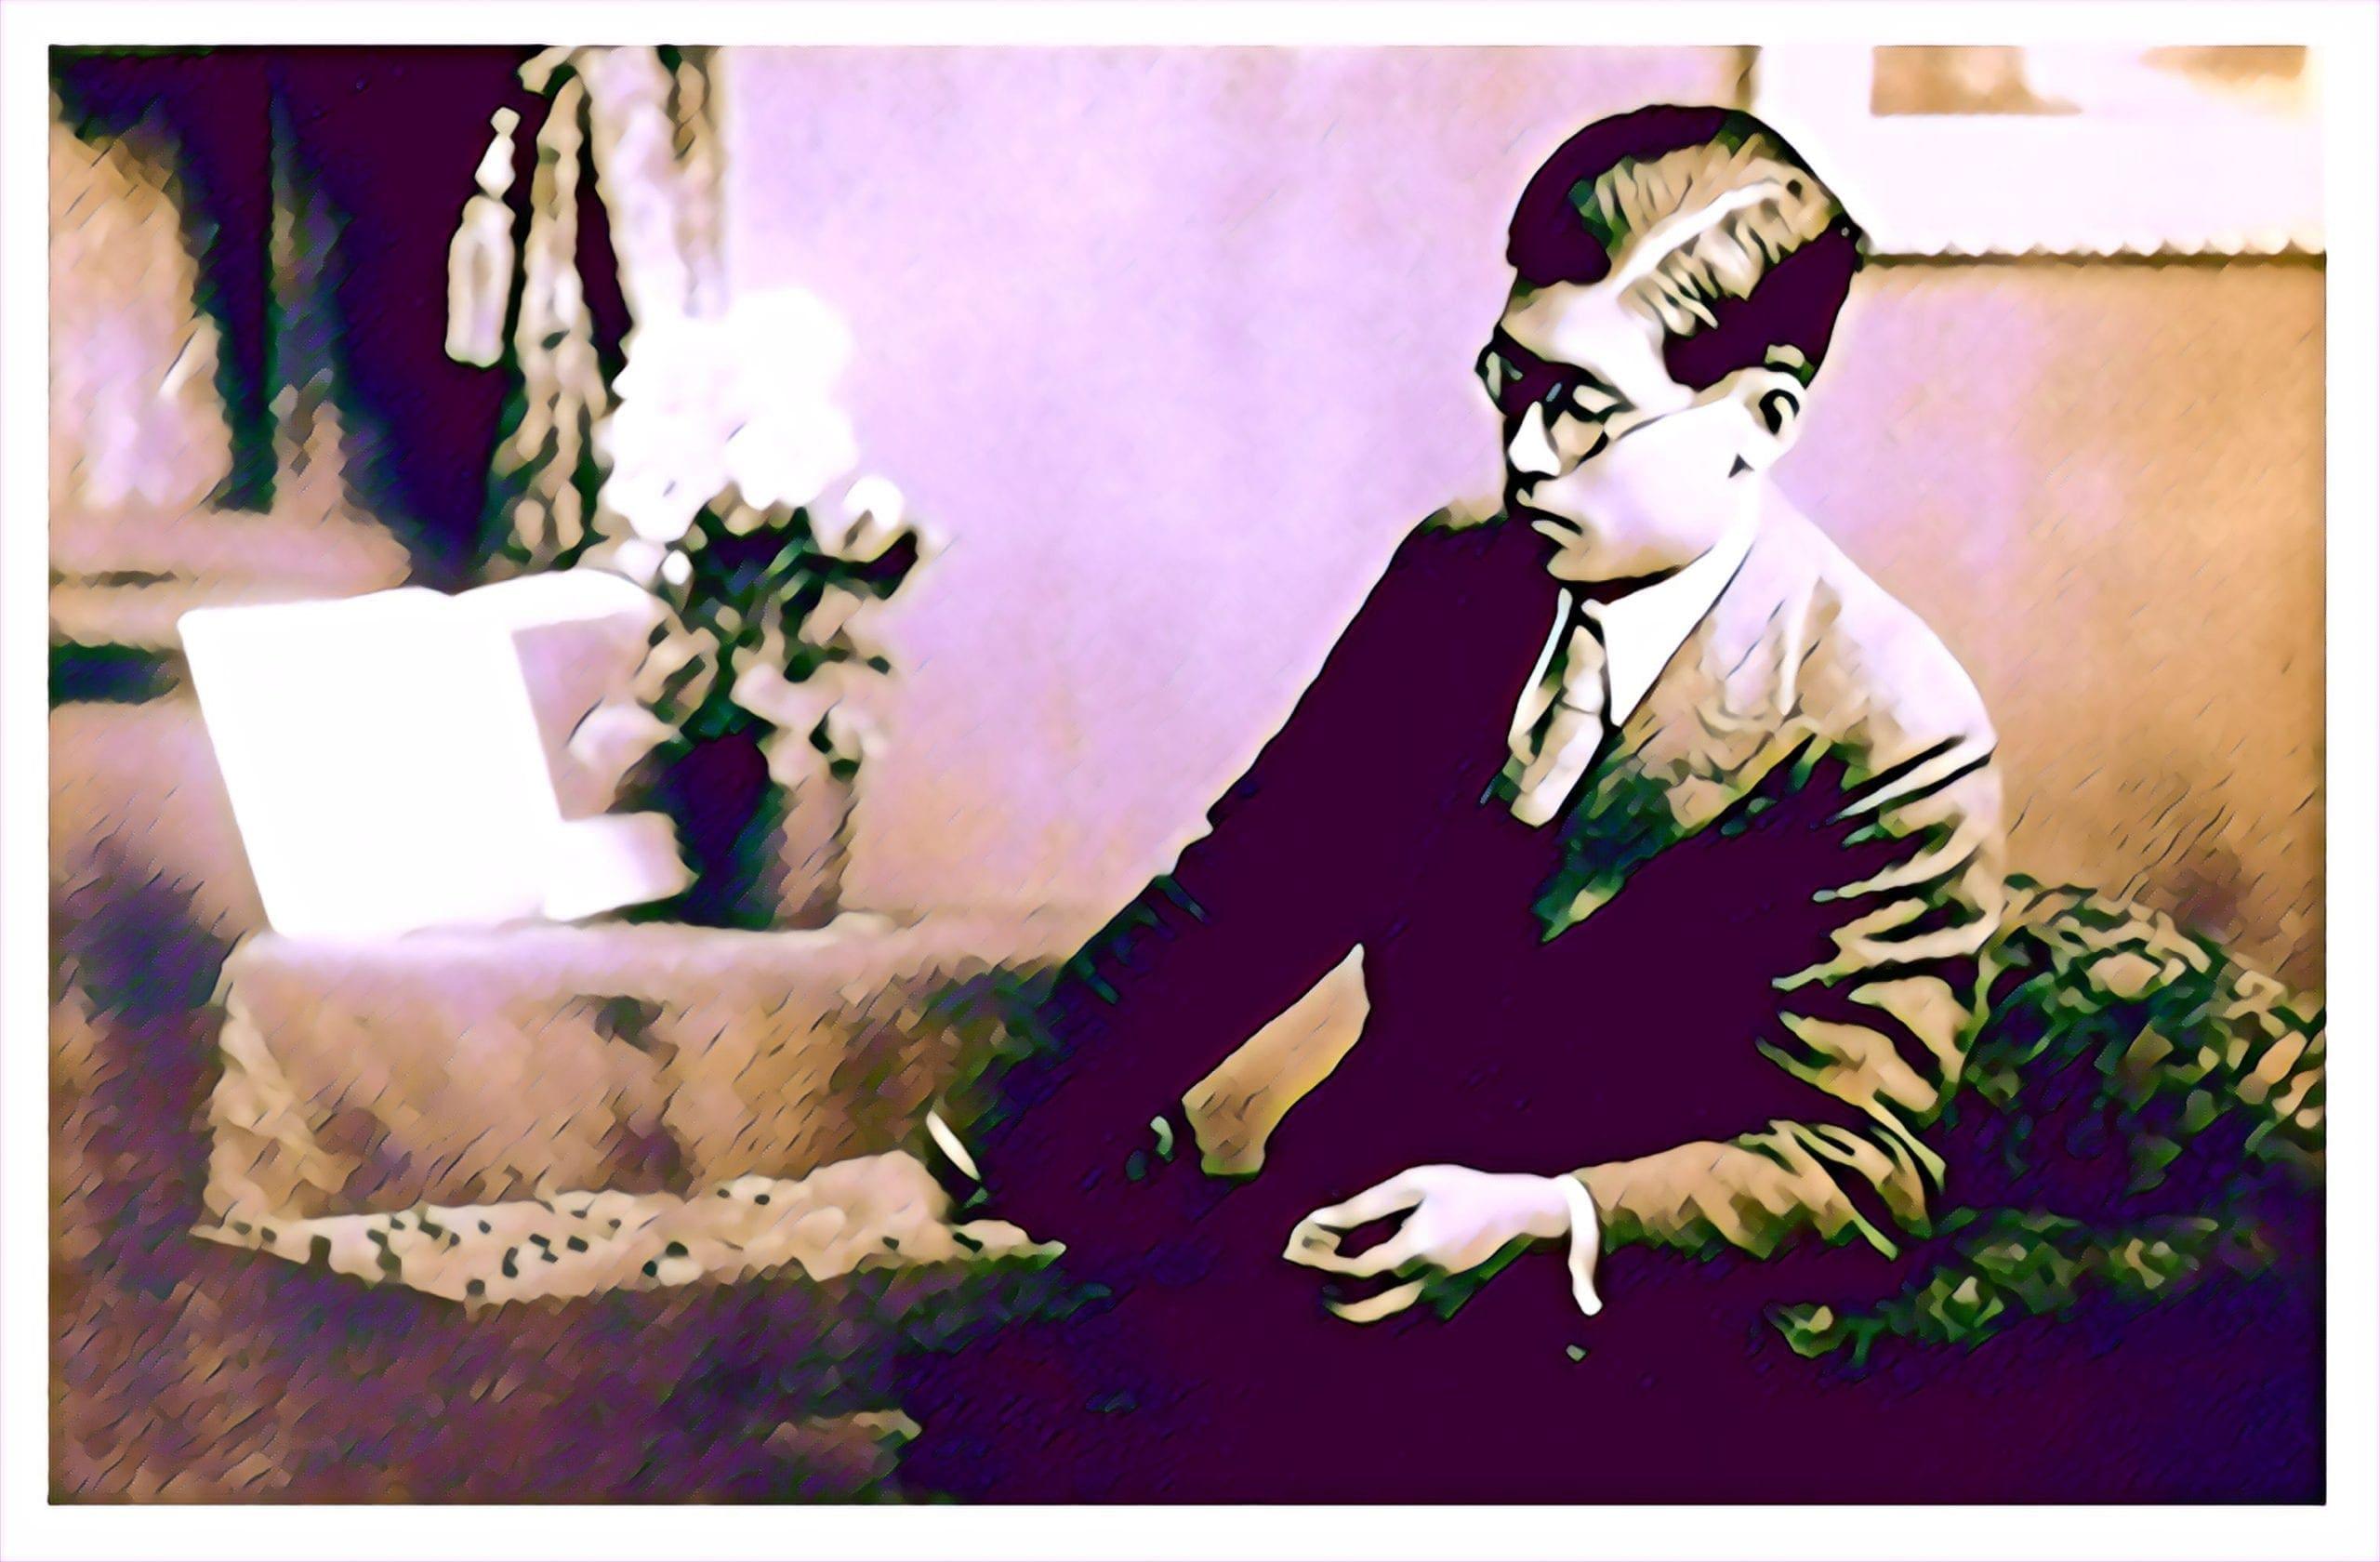 Atsushi Nakajima, Author, Maplopo